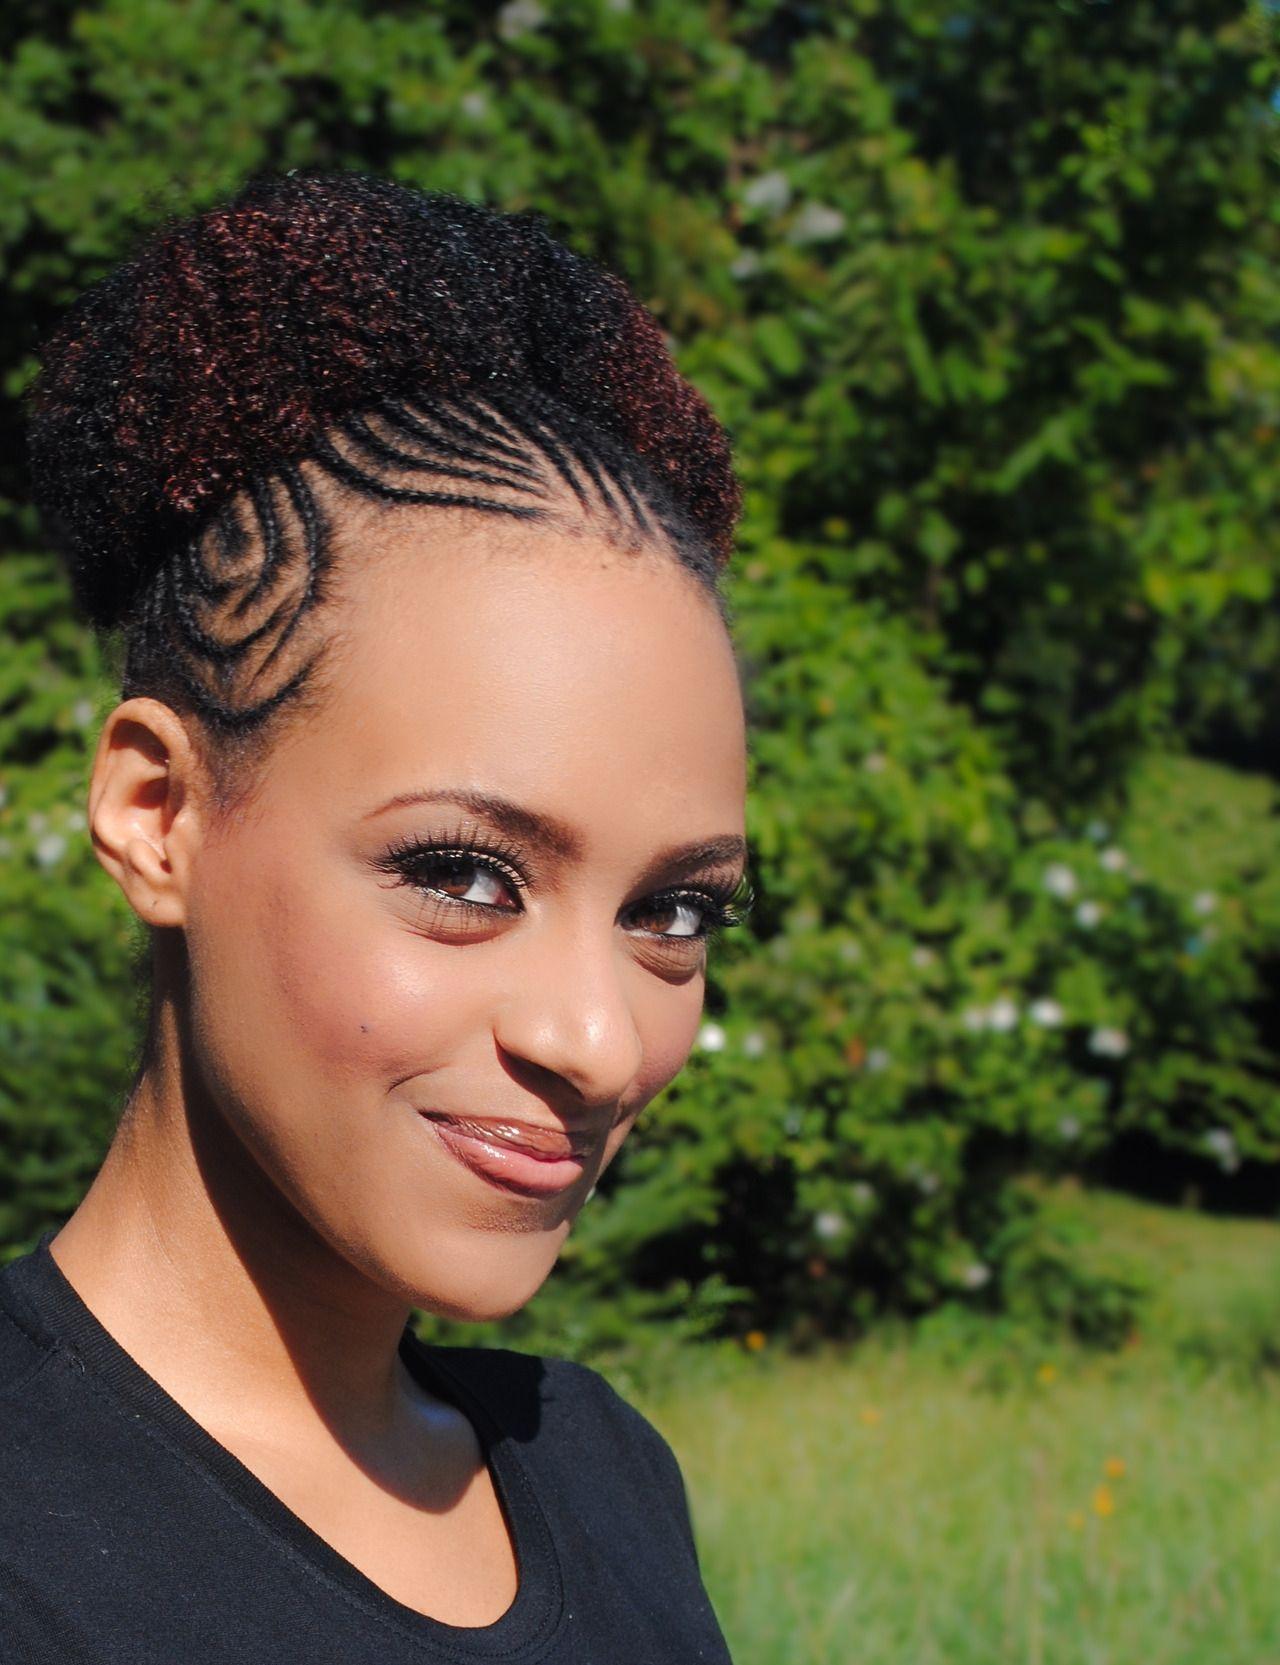 Black Braided Bun Hairstyles New Braided Hair Trend For Black Women Popular Black Braided